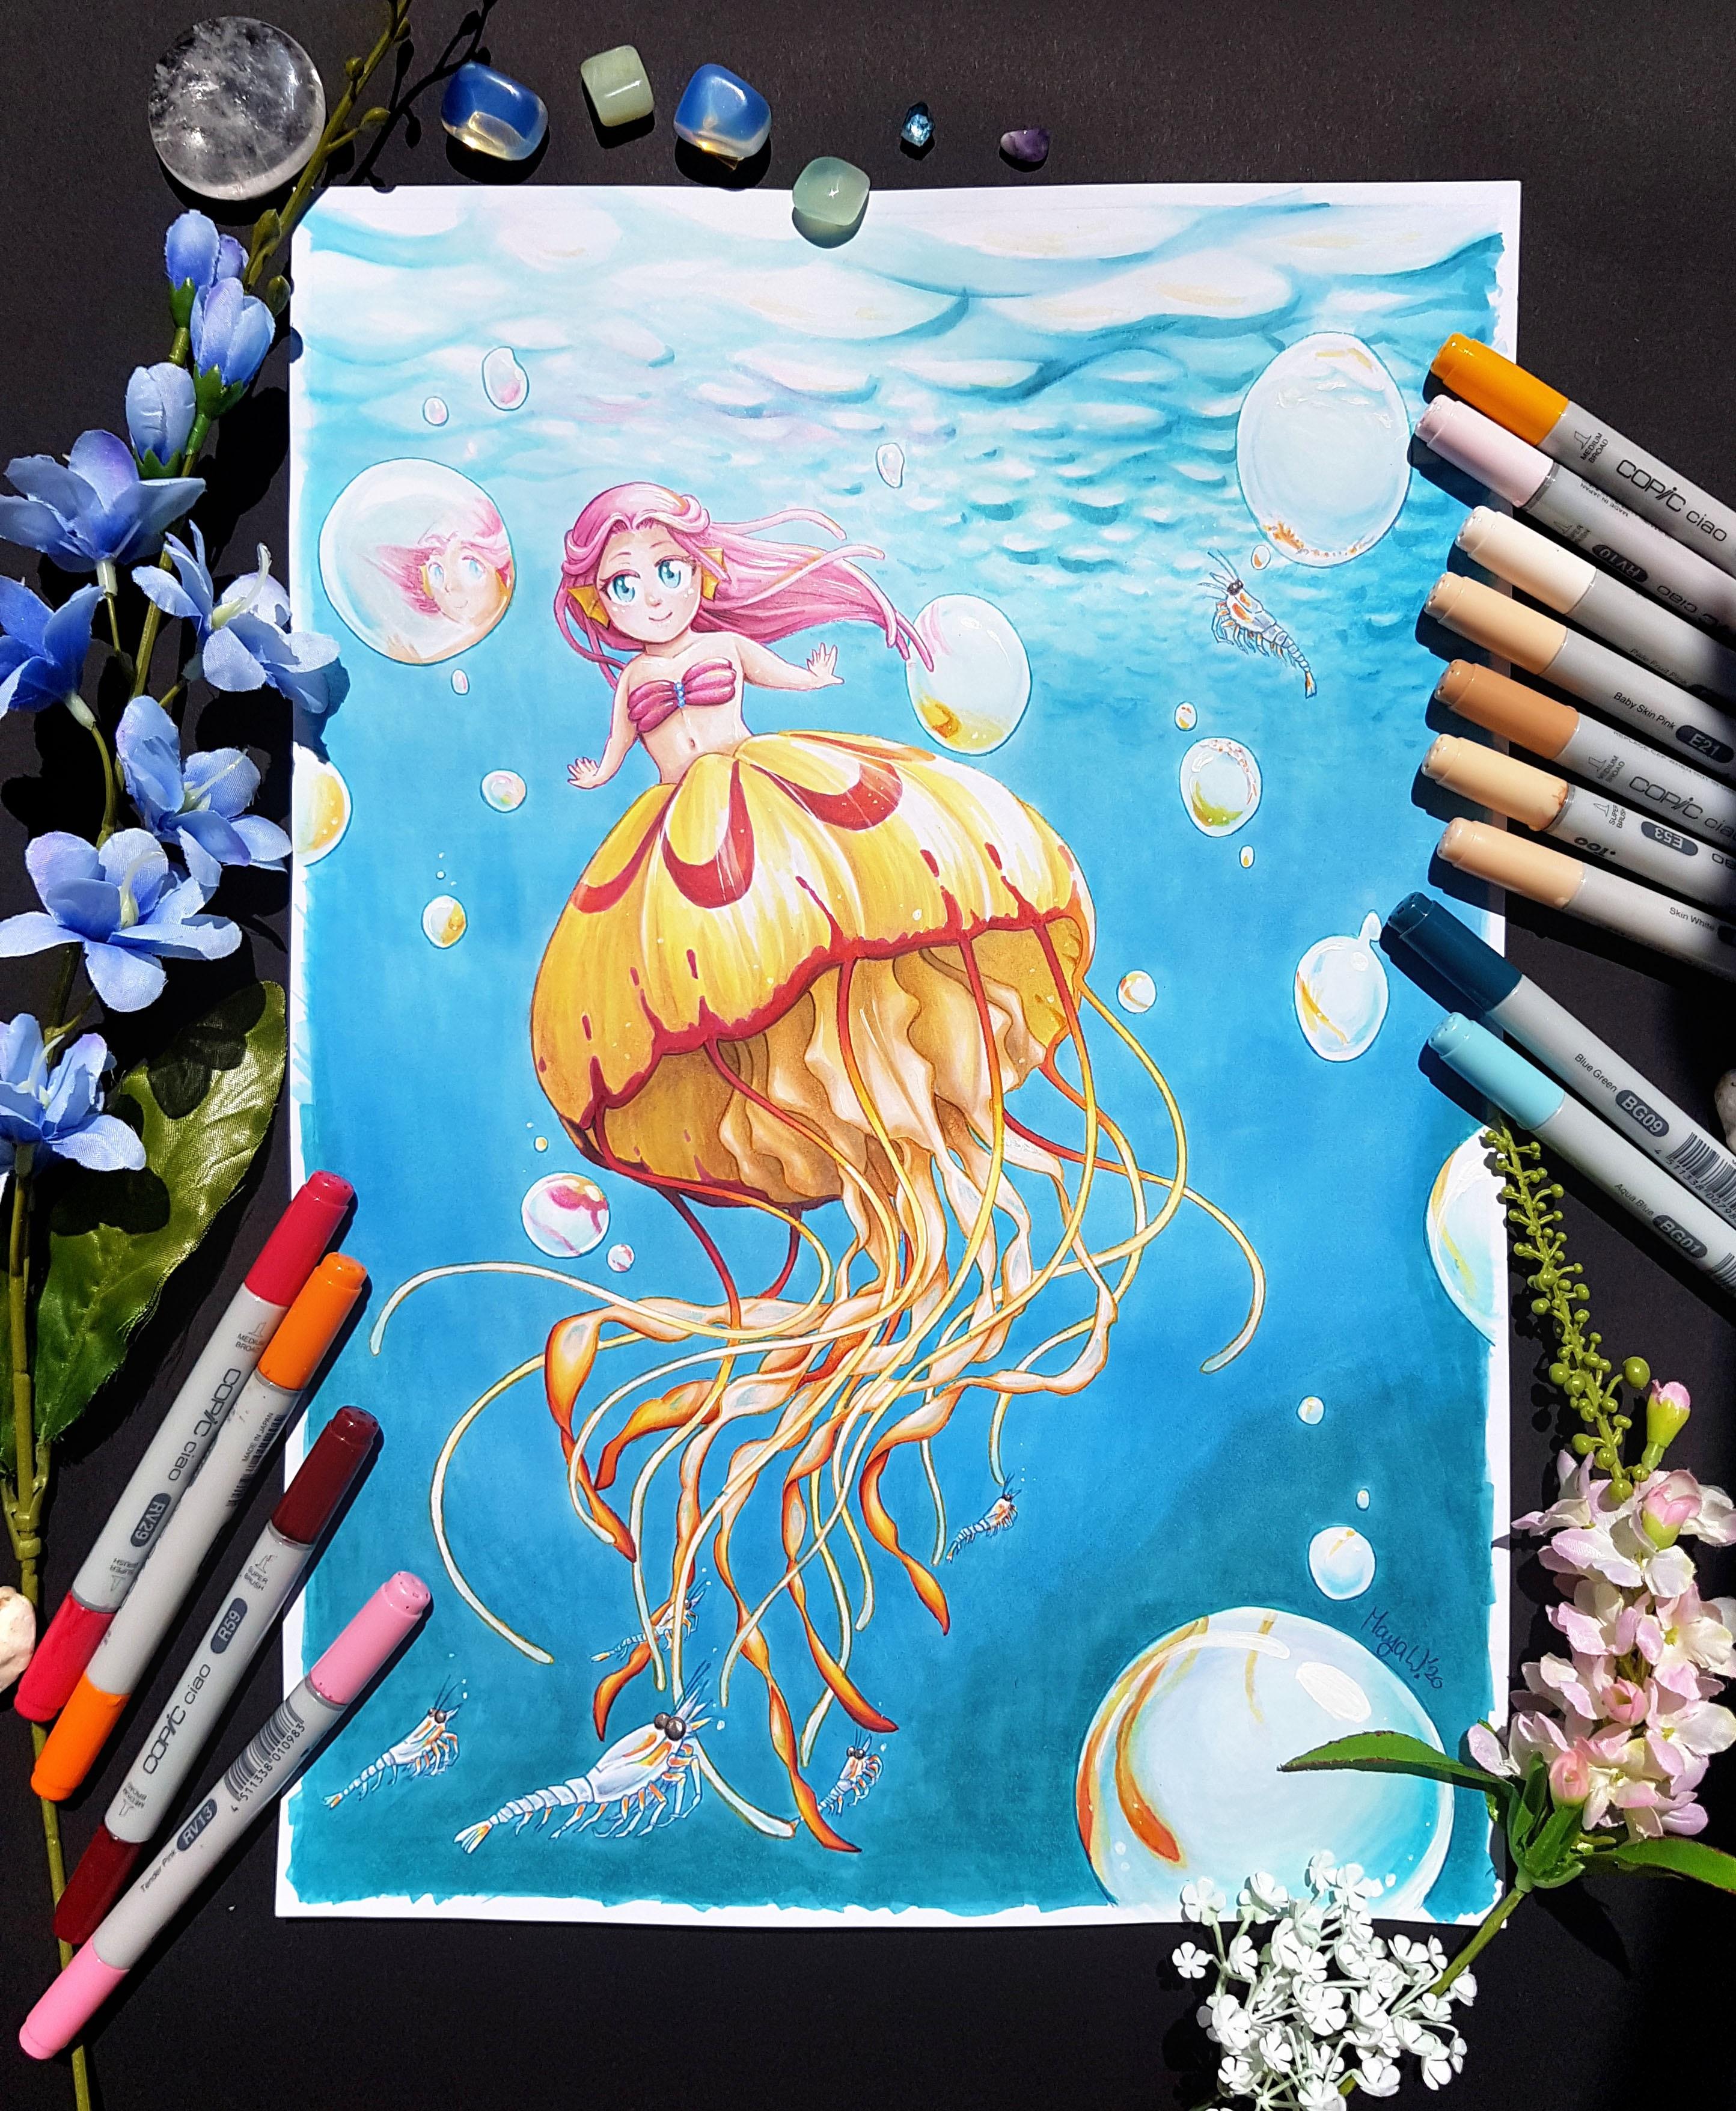 PHOTO 01 - tiny jellyfish meraid dancing with krill - Maya Wendler - Listenes 2020